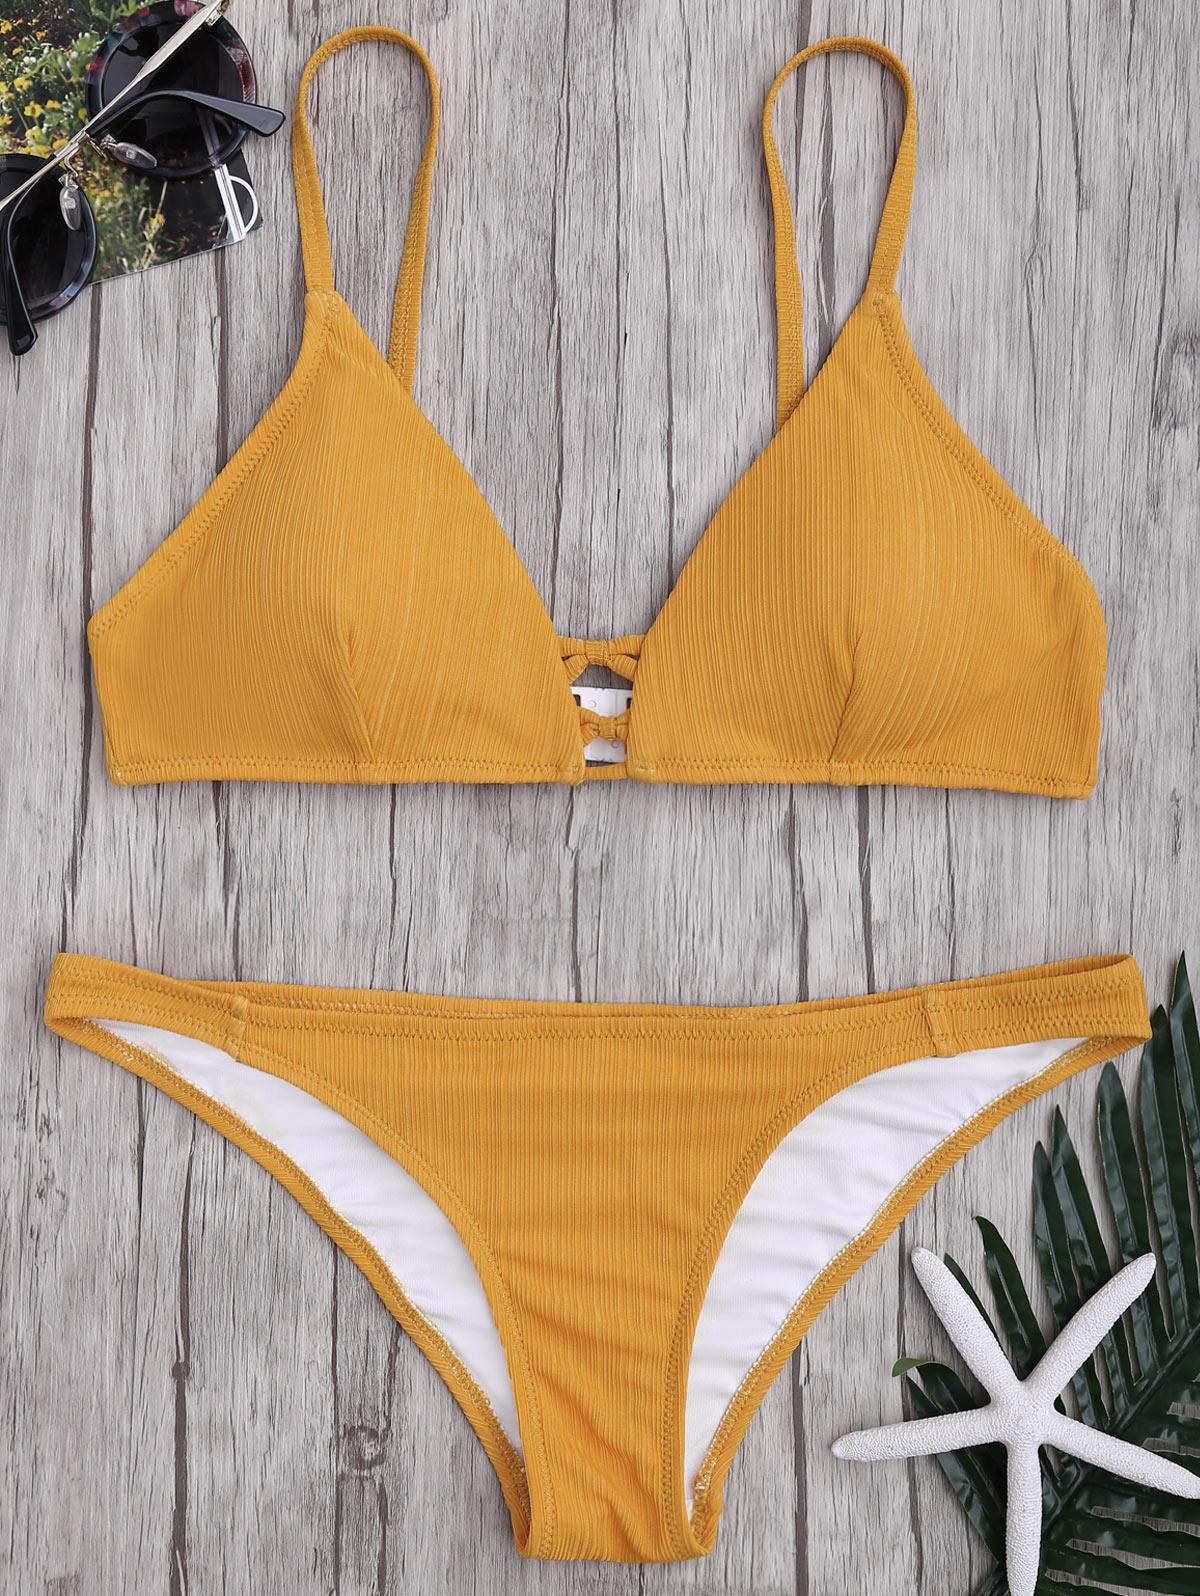 wholesale Criss Cross Spaghetti Strap Texture Bikini Set Mid Waisted Solid Color Swimsuit biquinis feminino Summer Swimwear